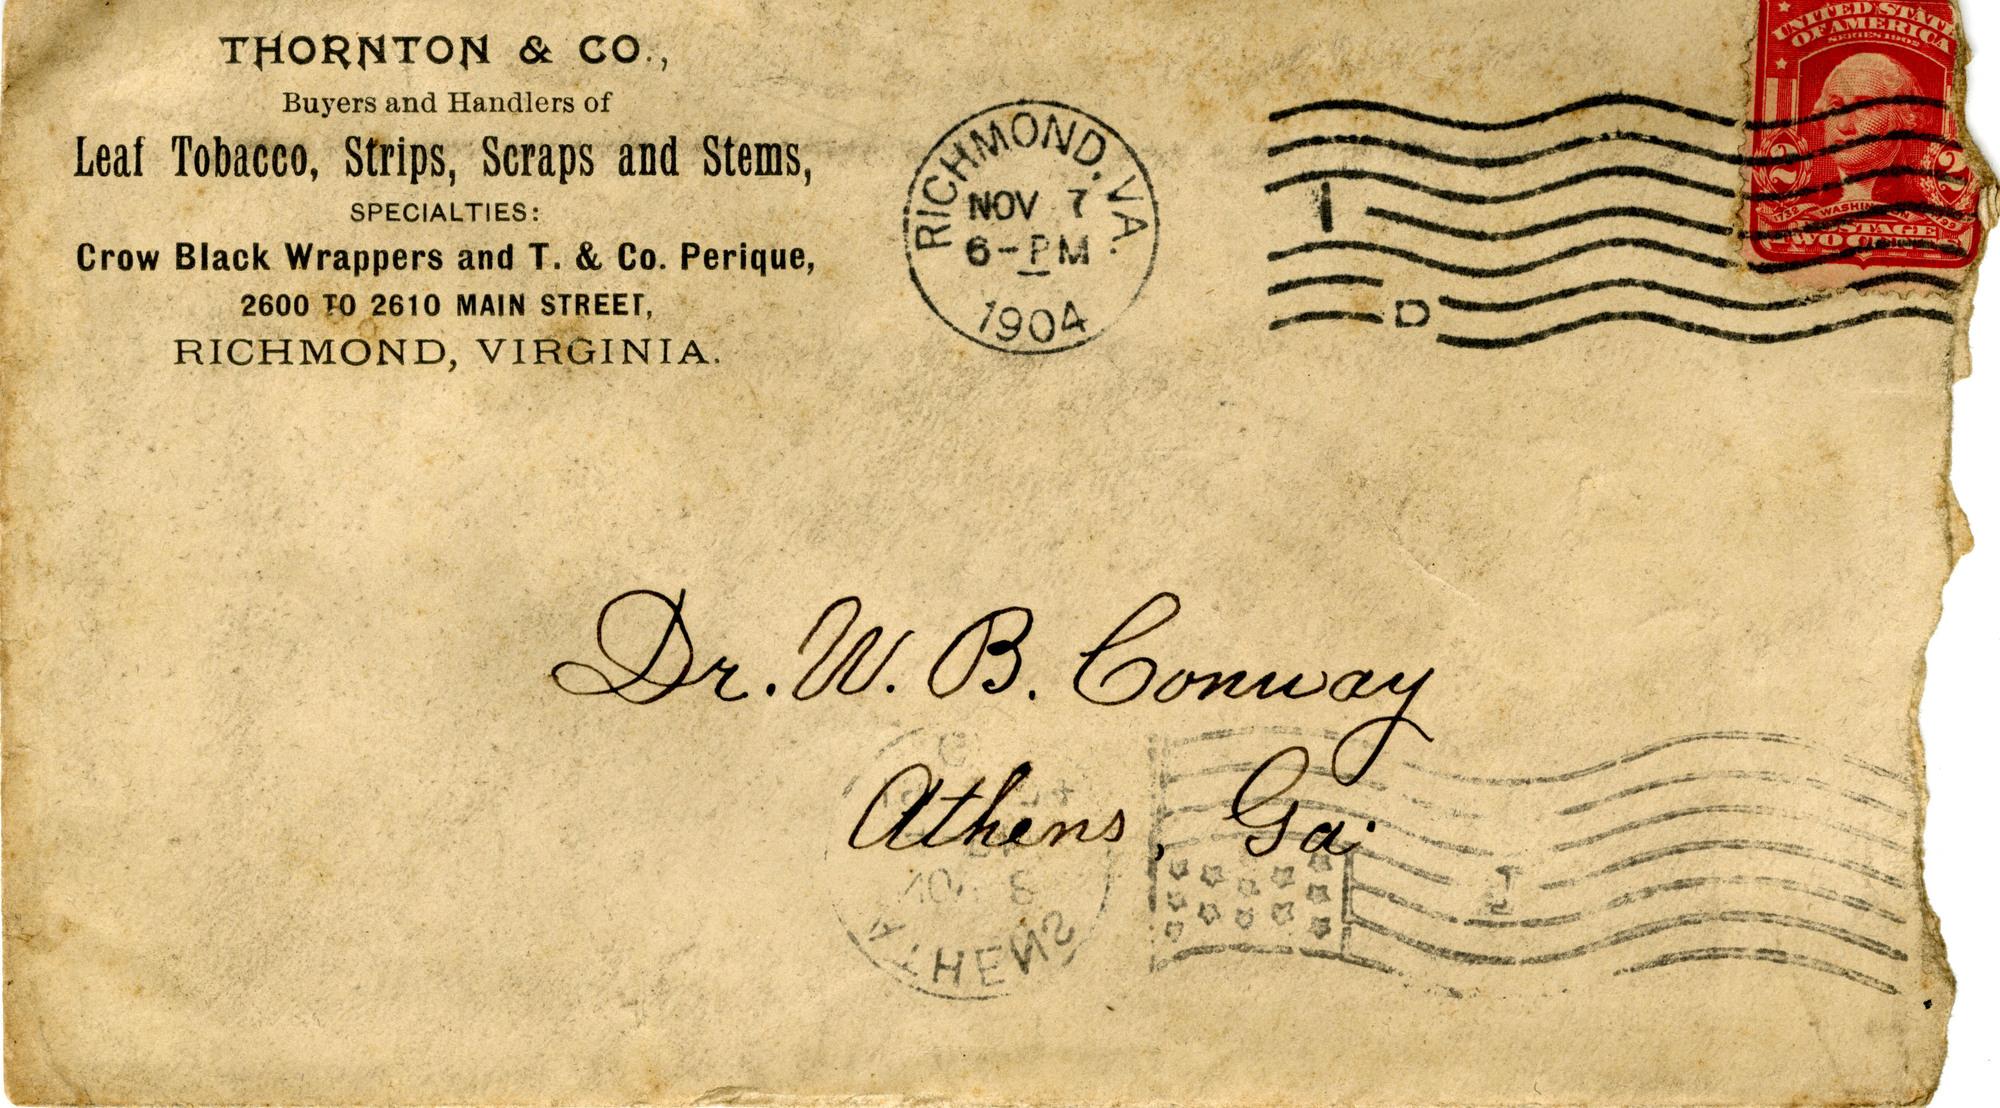 http://spec.lib.vt.edu/pickup/Omeka_upload/Ms2012-039_ConwayCatlett_F5_Letter_1904_1107_enva.jpg